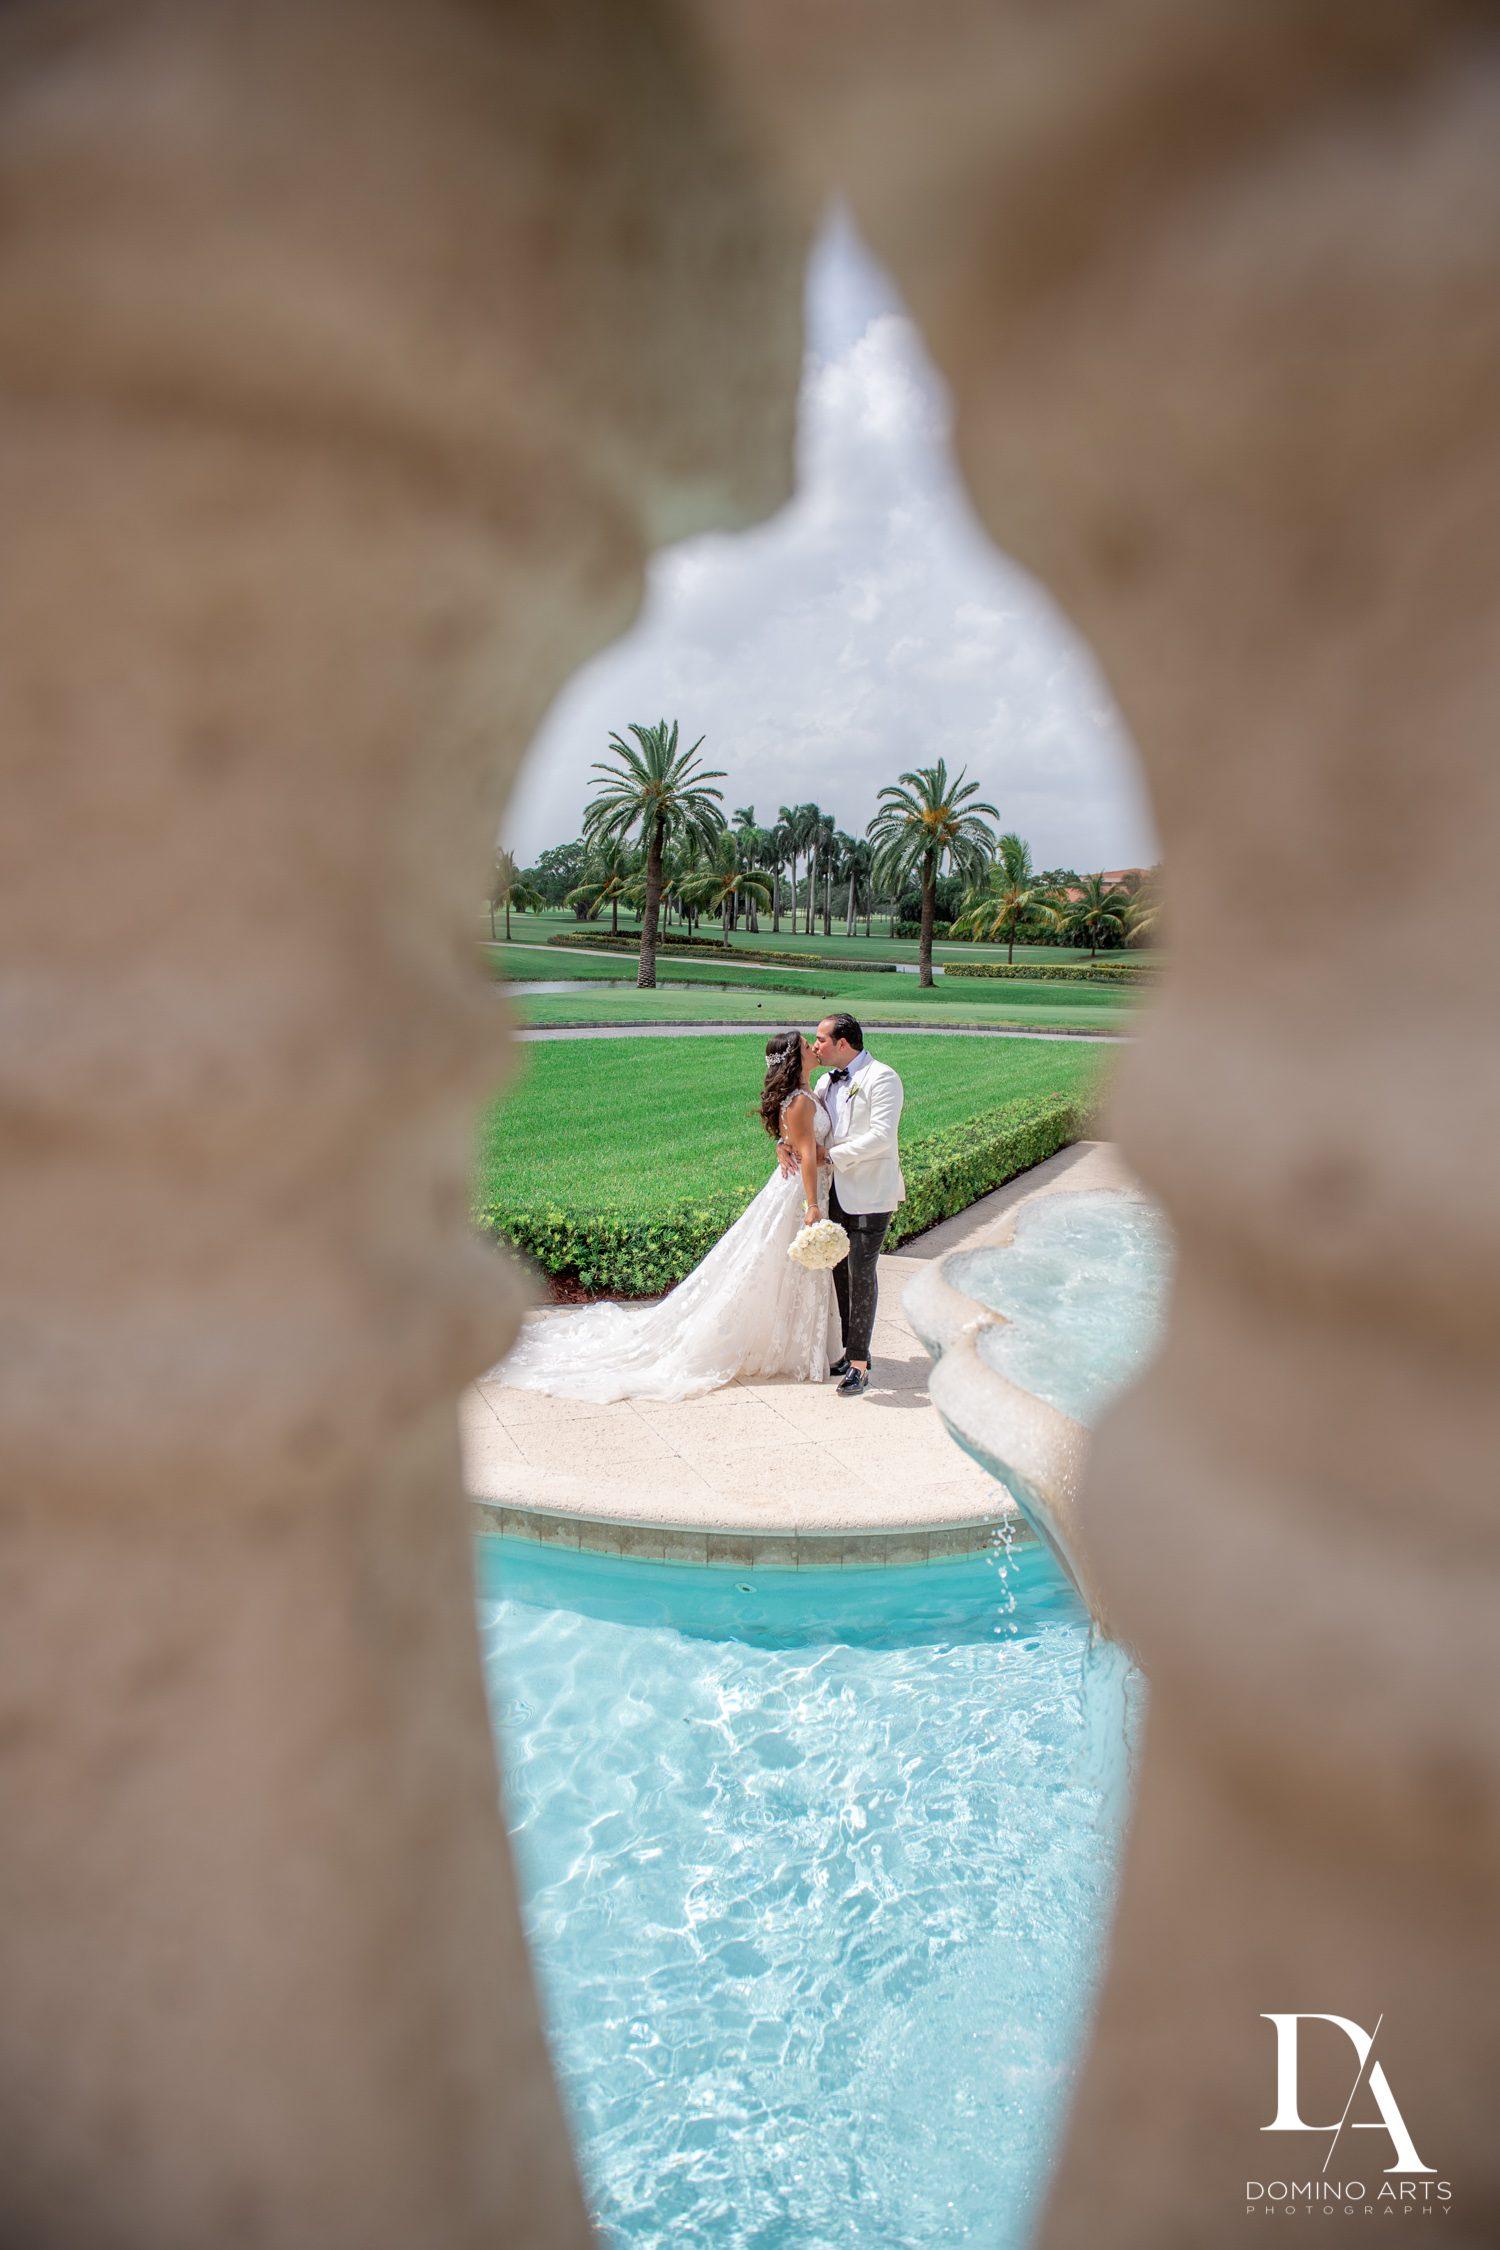 creative portrait at Elegant Classy Wedding at Trump Doral by Domino Arts Photography